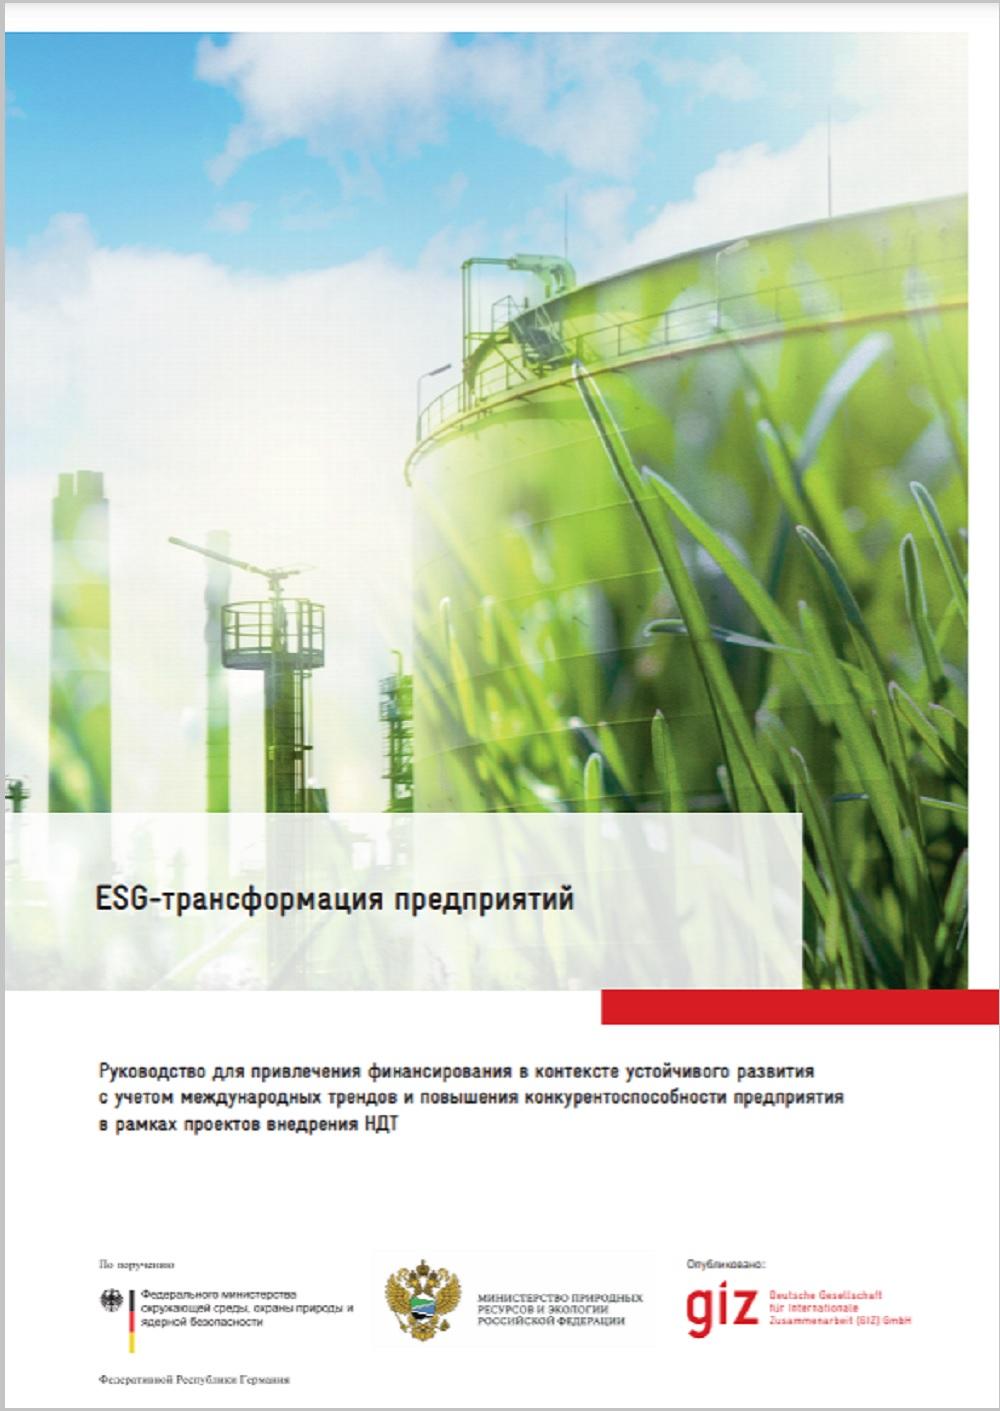 Руководство по ESG-трансформации предприятий